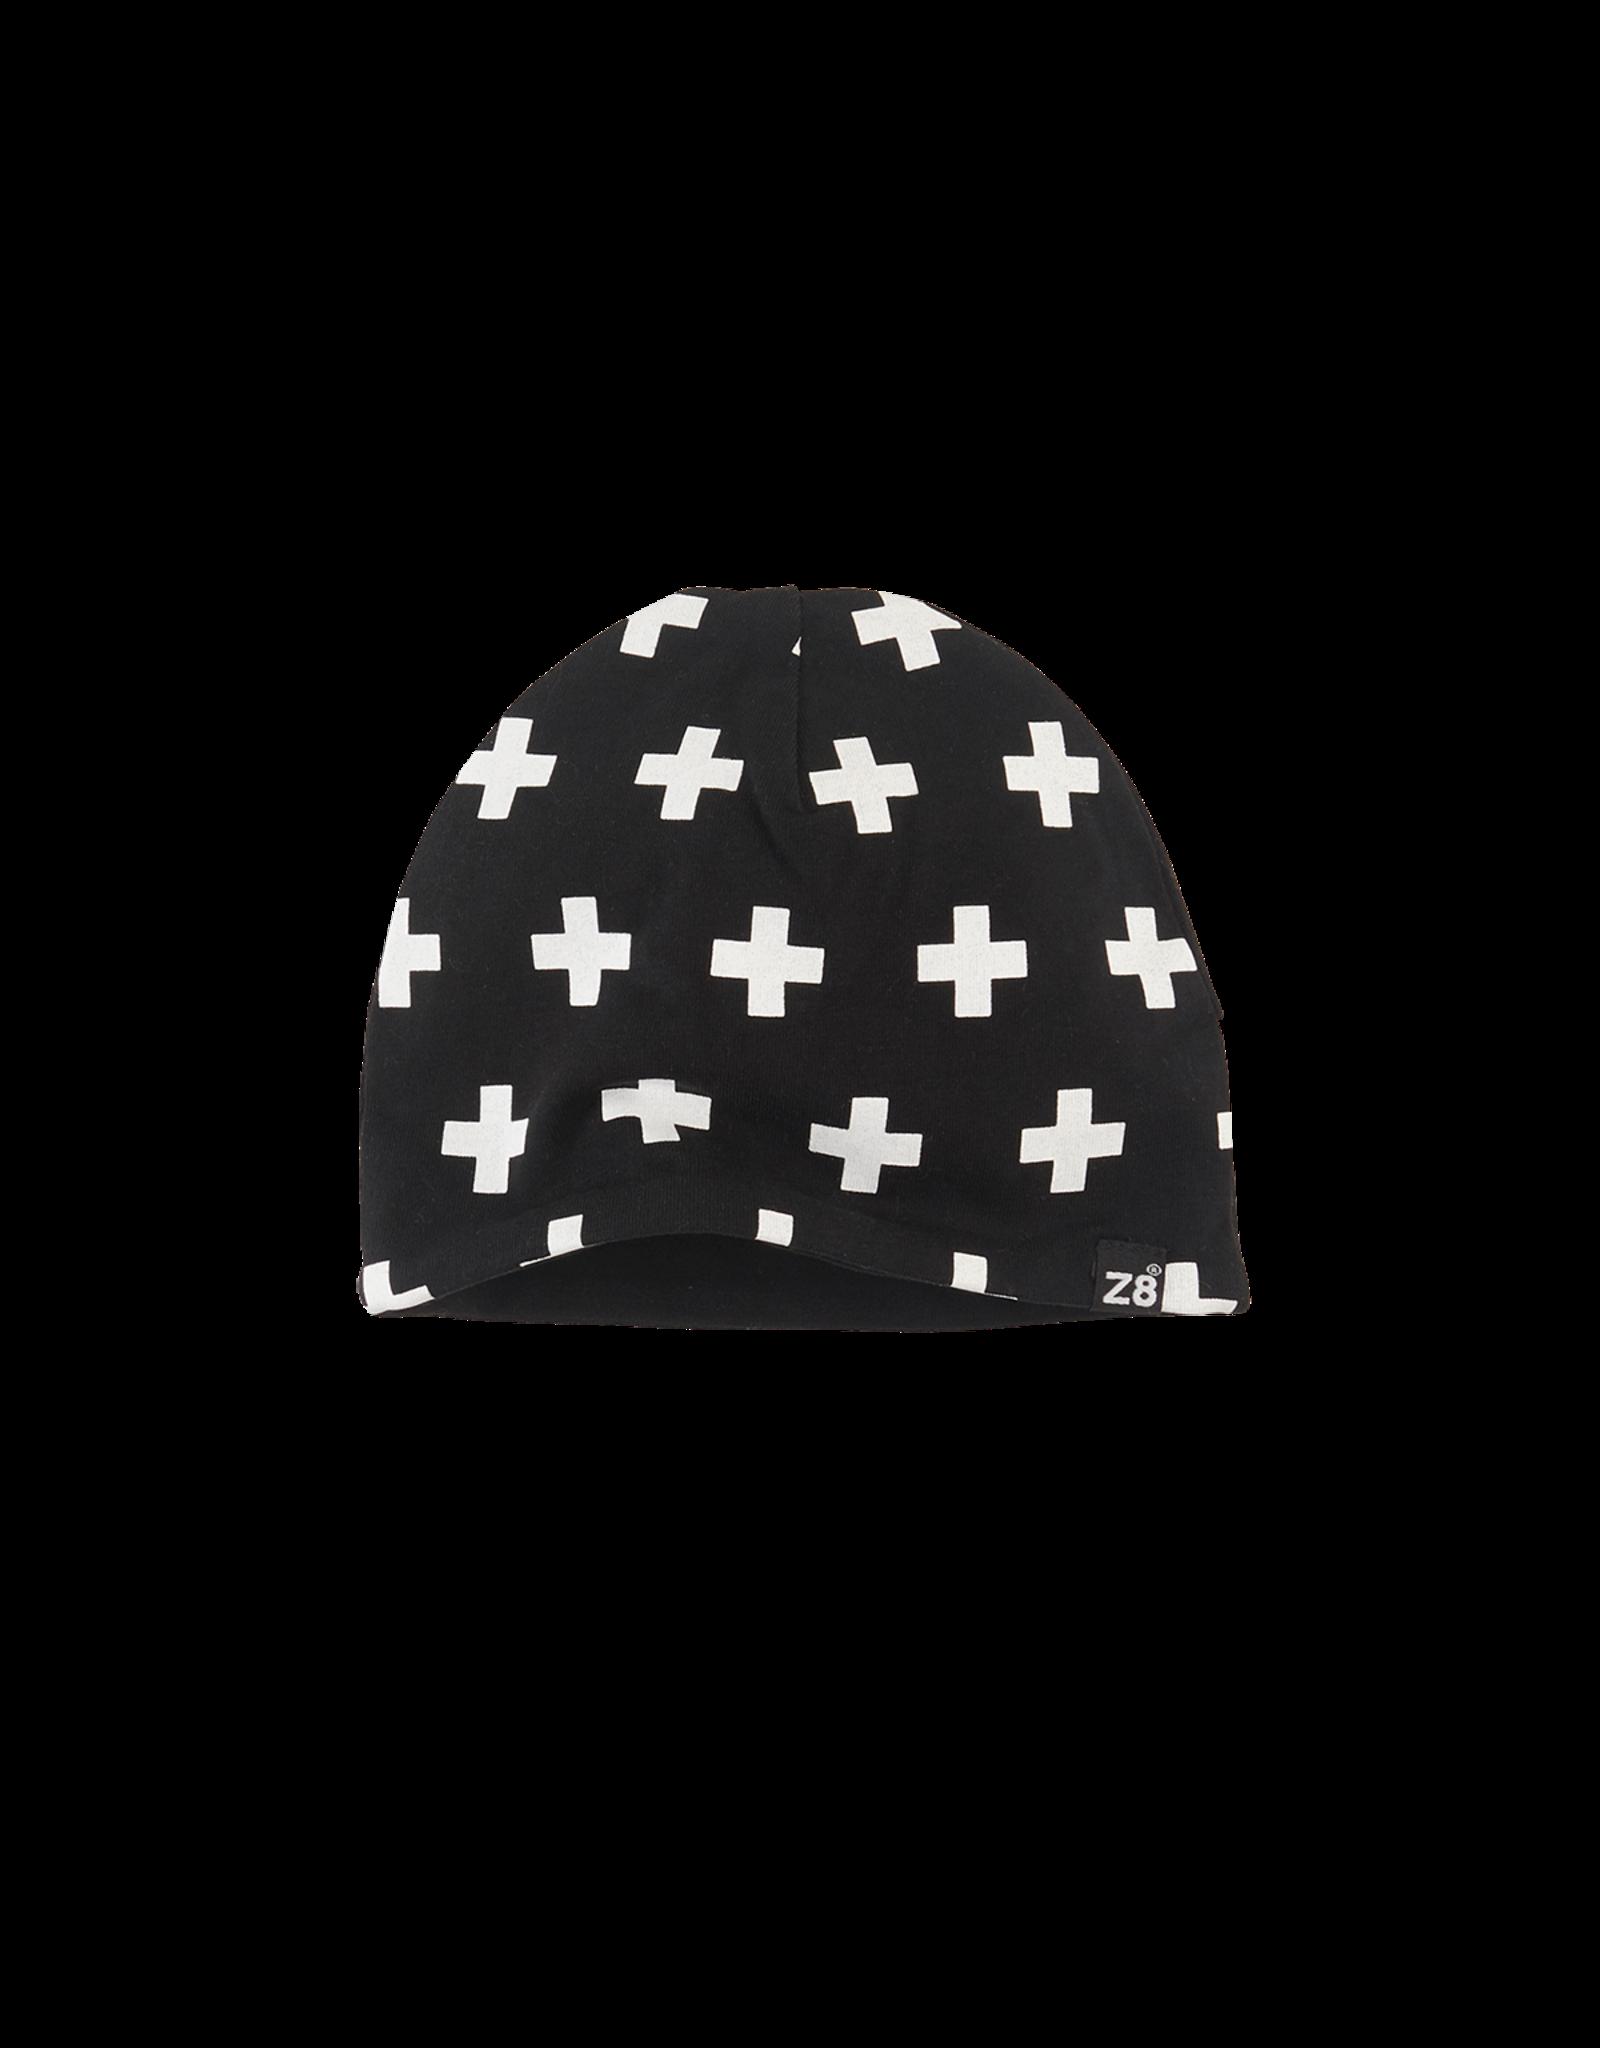 Z8 Cat Black/White/Crosses